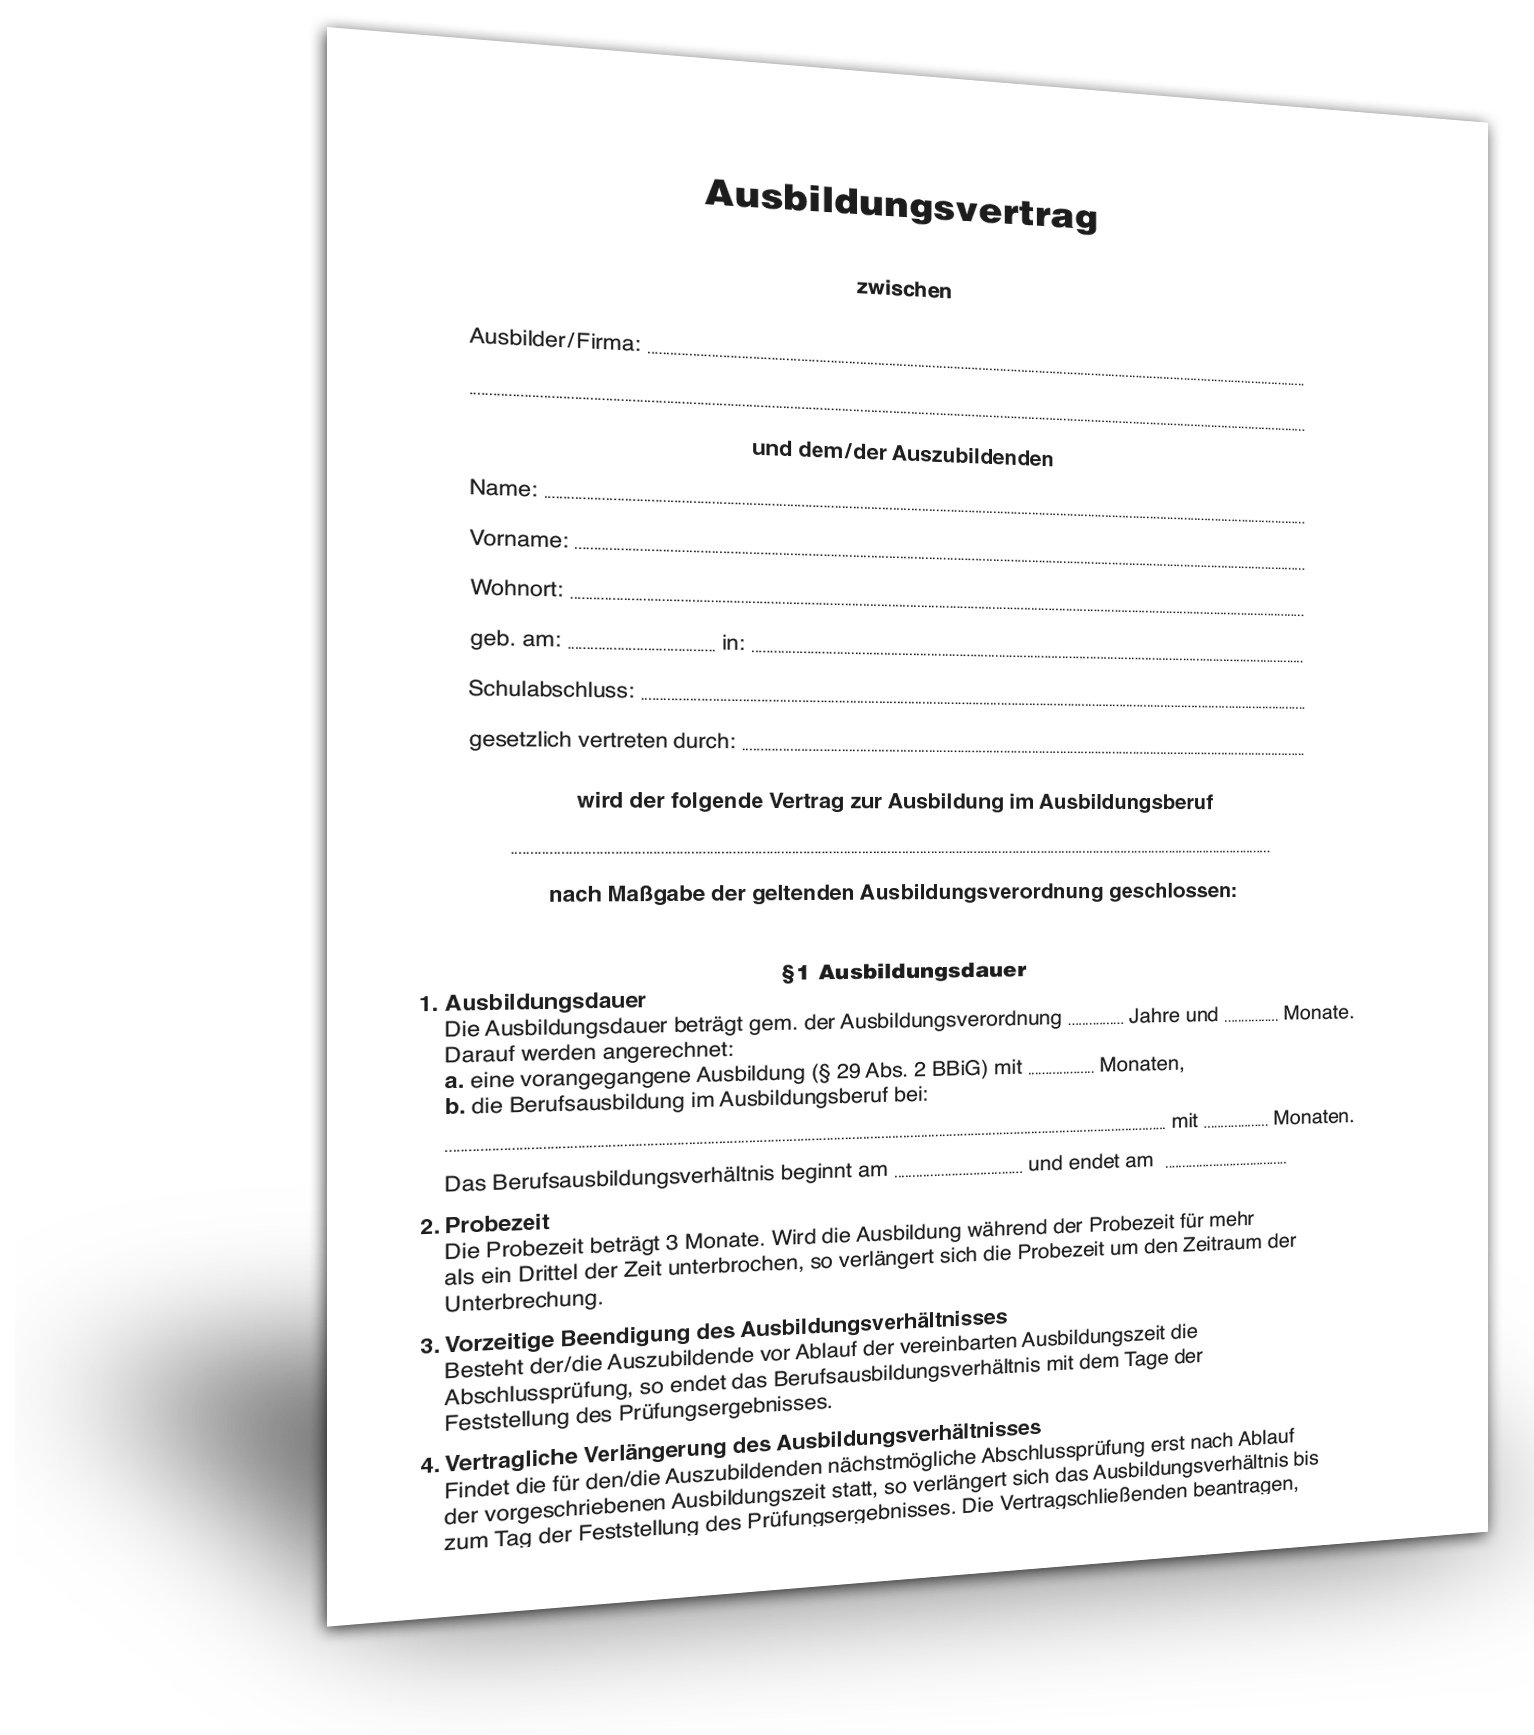 Ausbildungsvertrag Muster